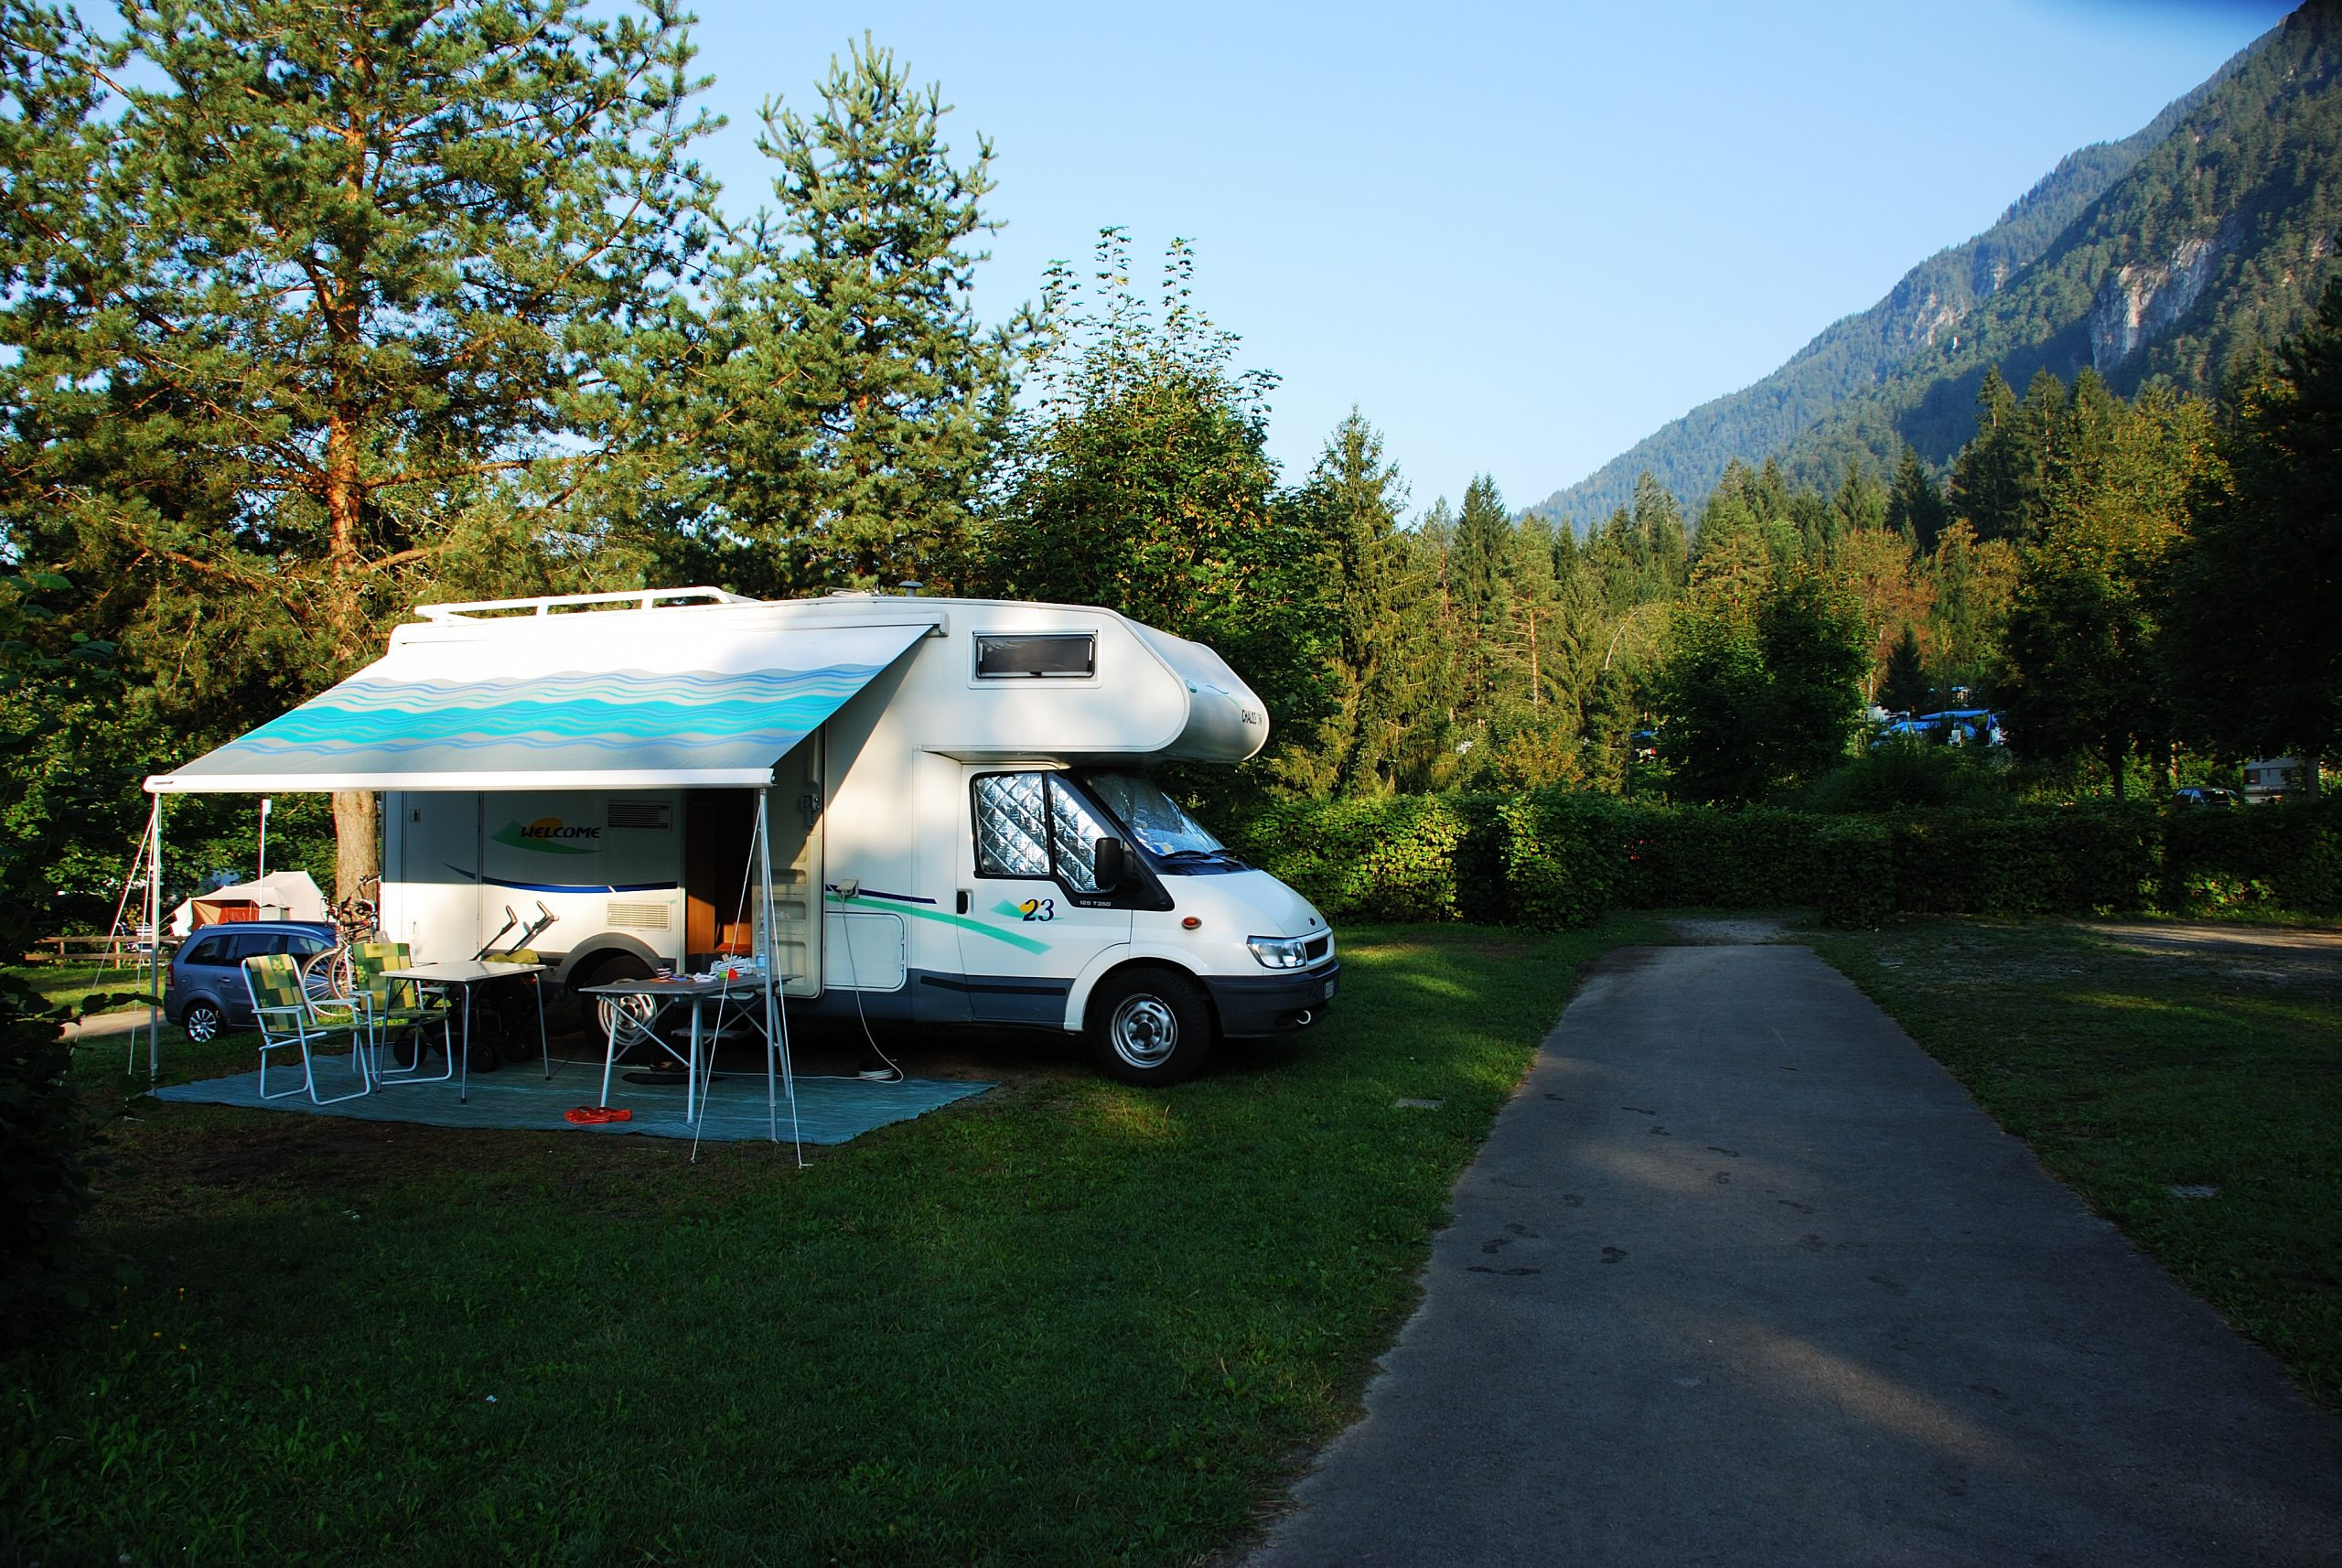 Pressenger See Austria camper